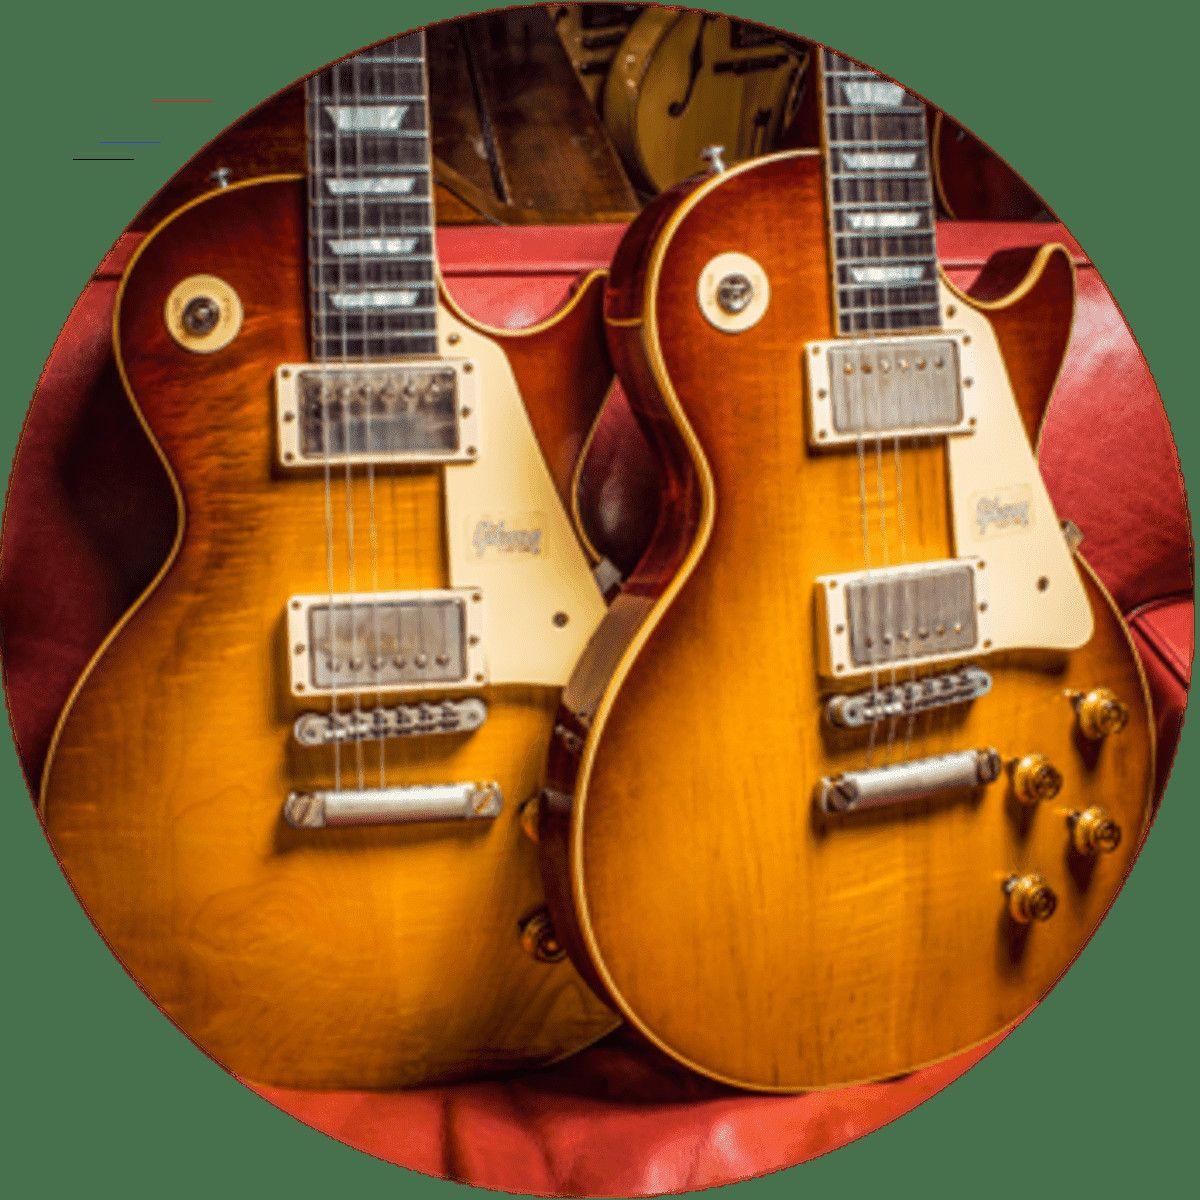 Gibson Guitars at Chicago Music Exchange gibsonguitars